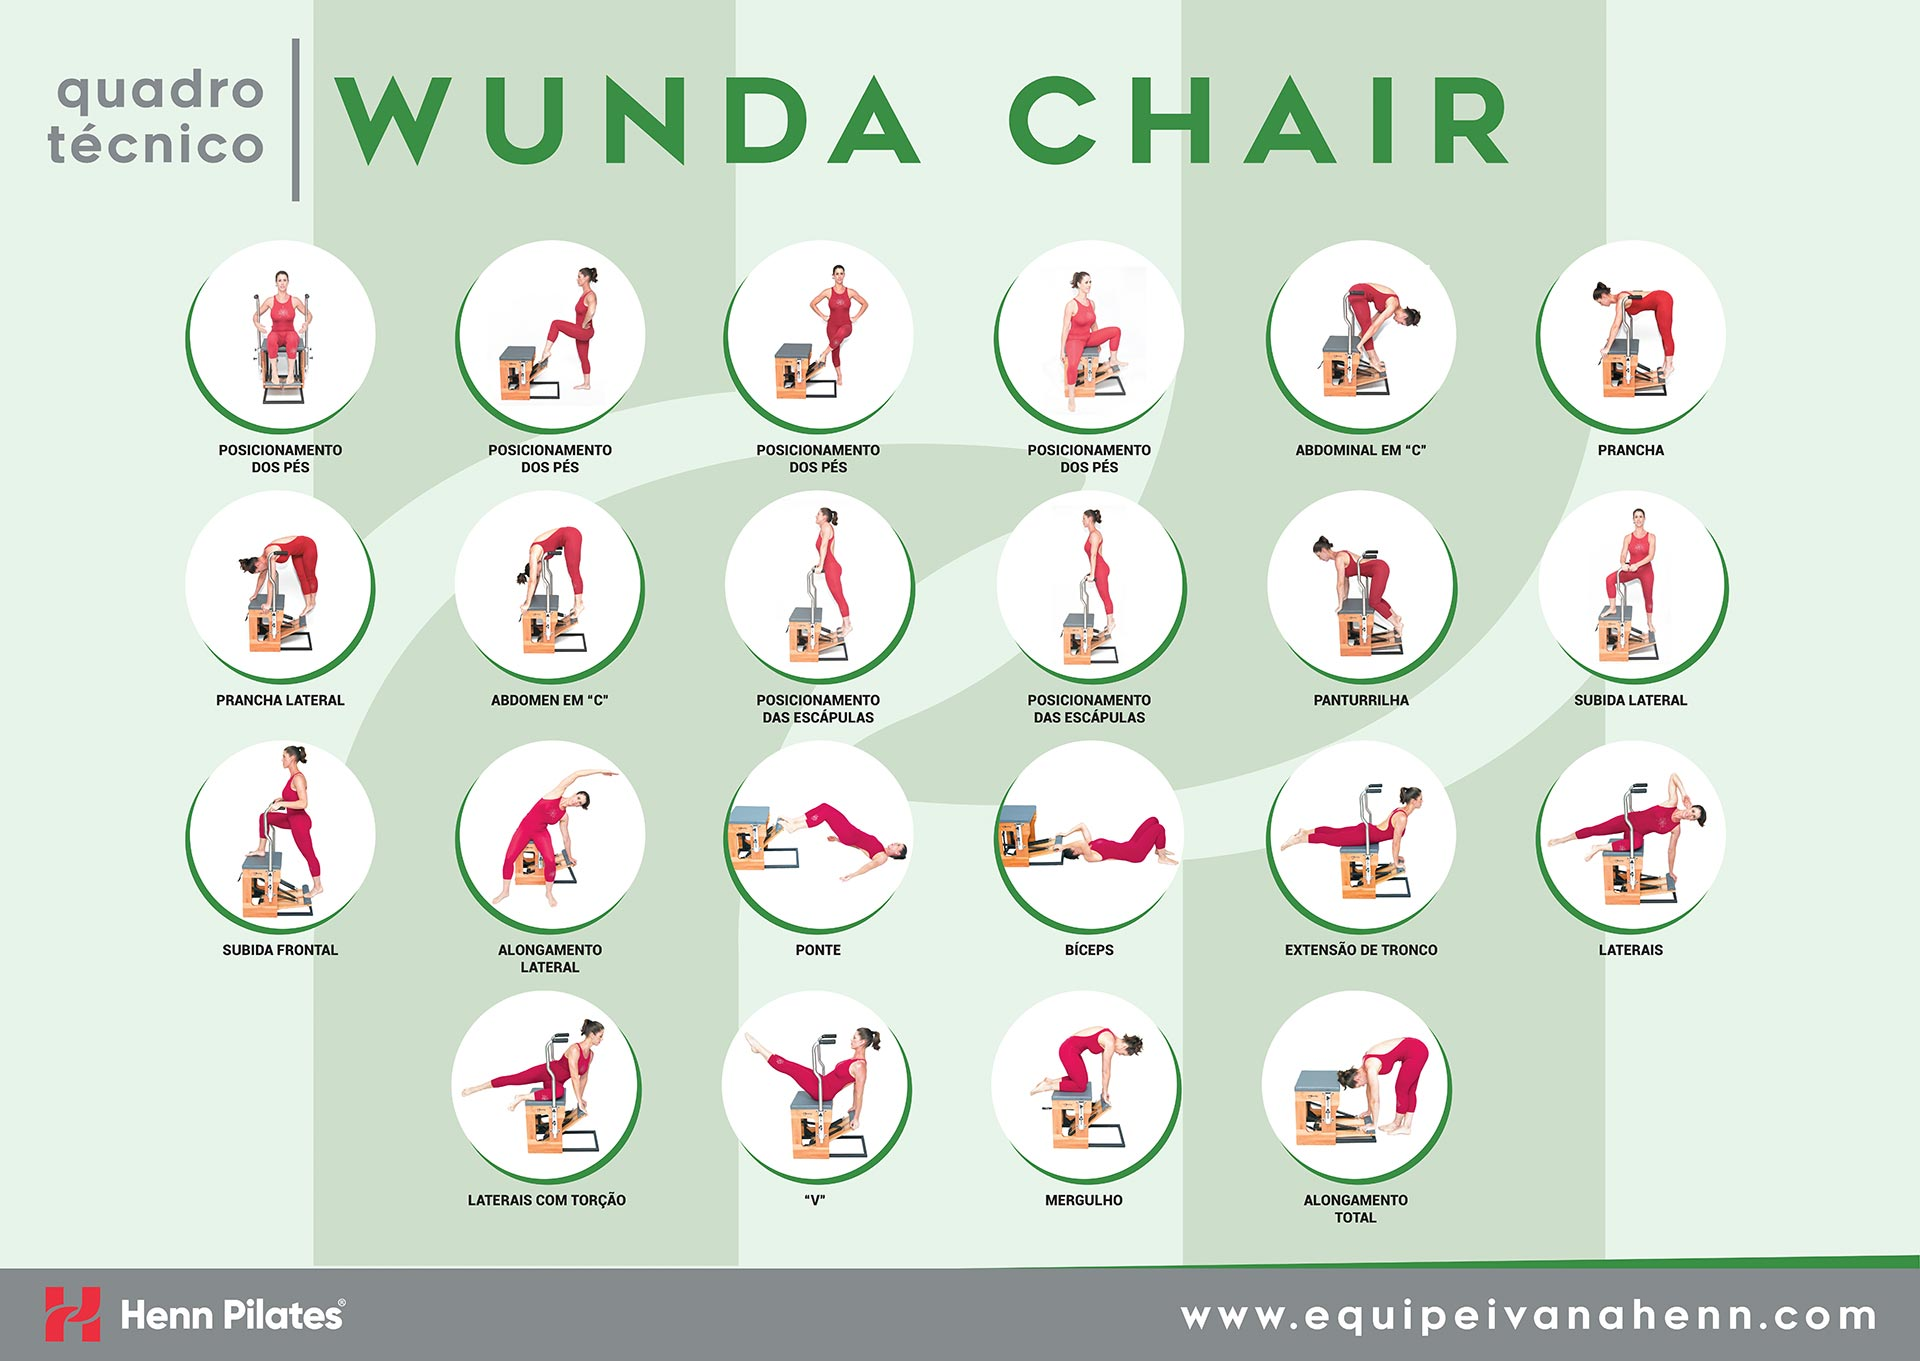 Quadro Técnico Wunda Chair